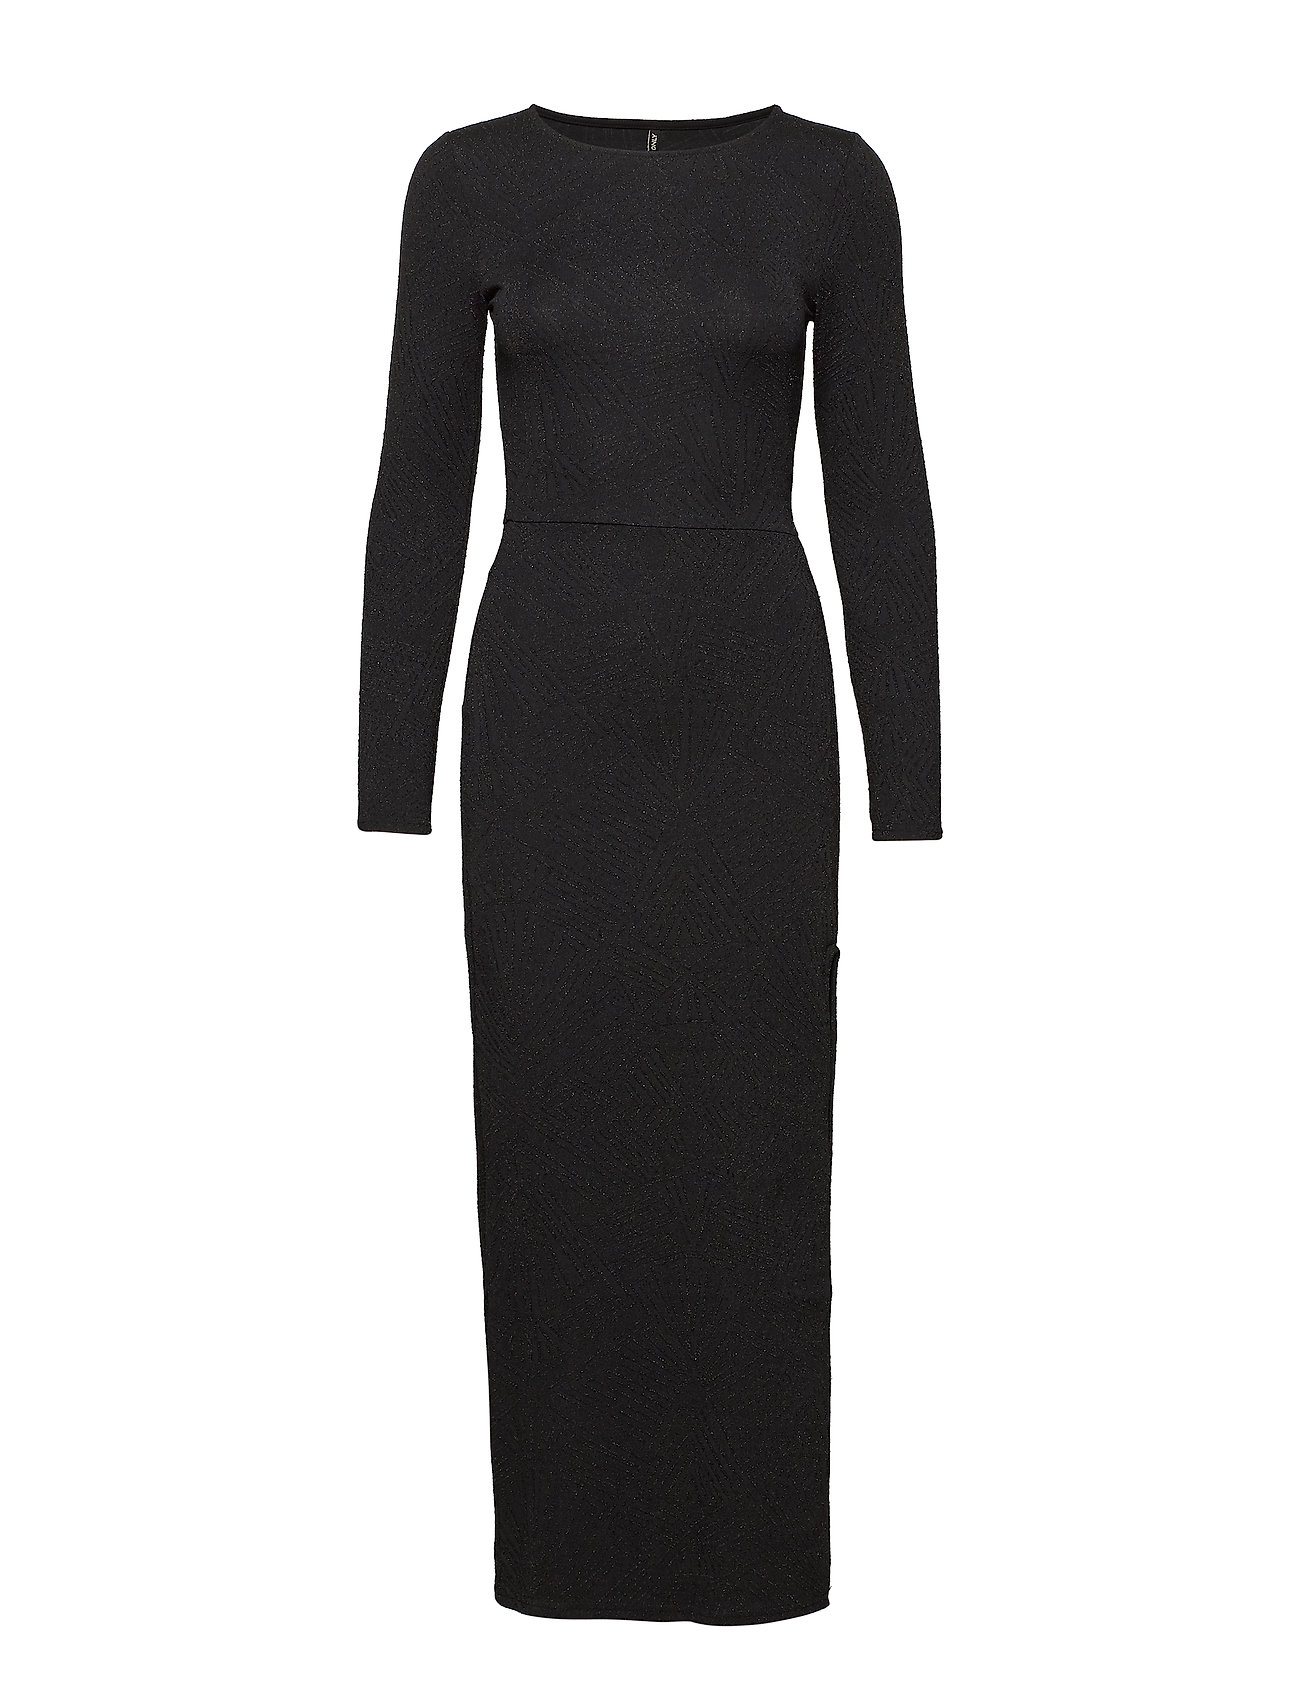 ONLY ONLSHINE L/S SLIT DRESS JRS - BLACK